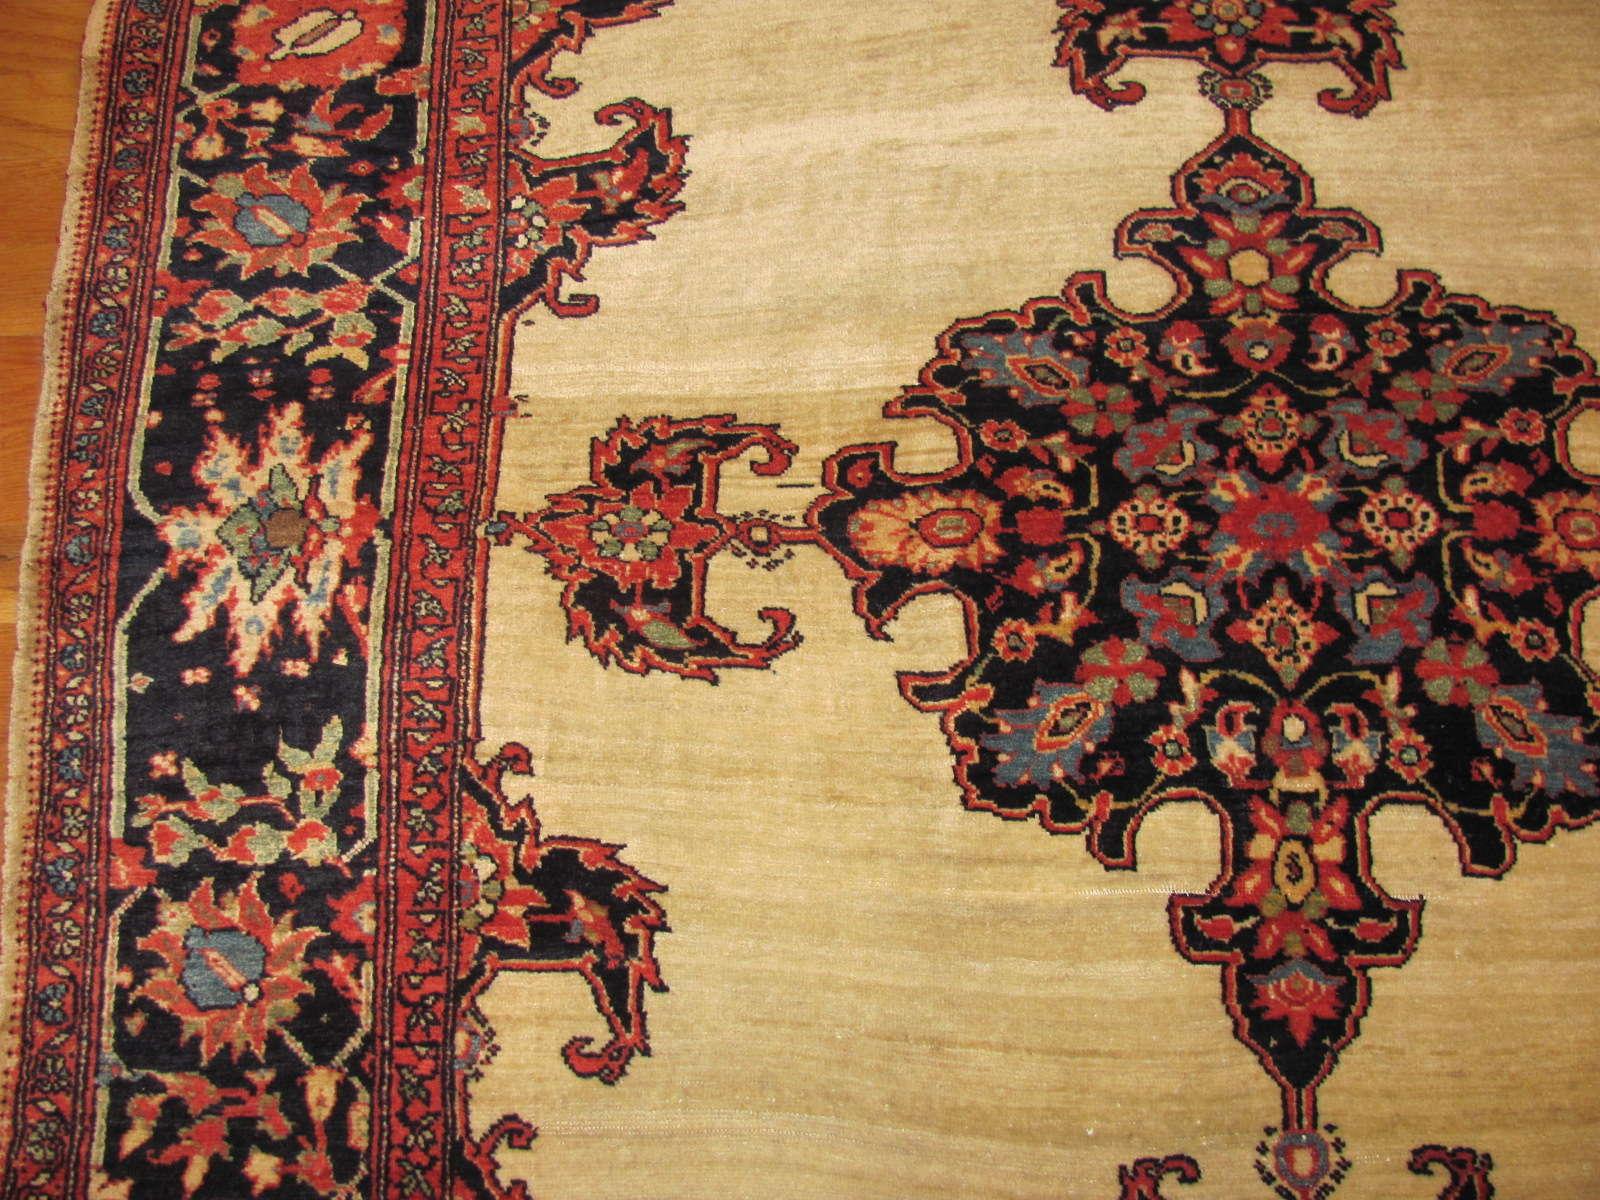 24837 antique persian sarouk fereghan rug 4,7x7,1-2